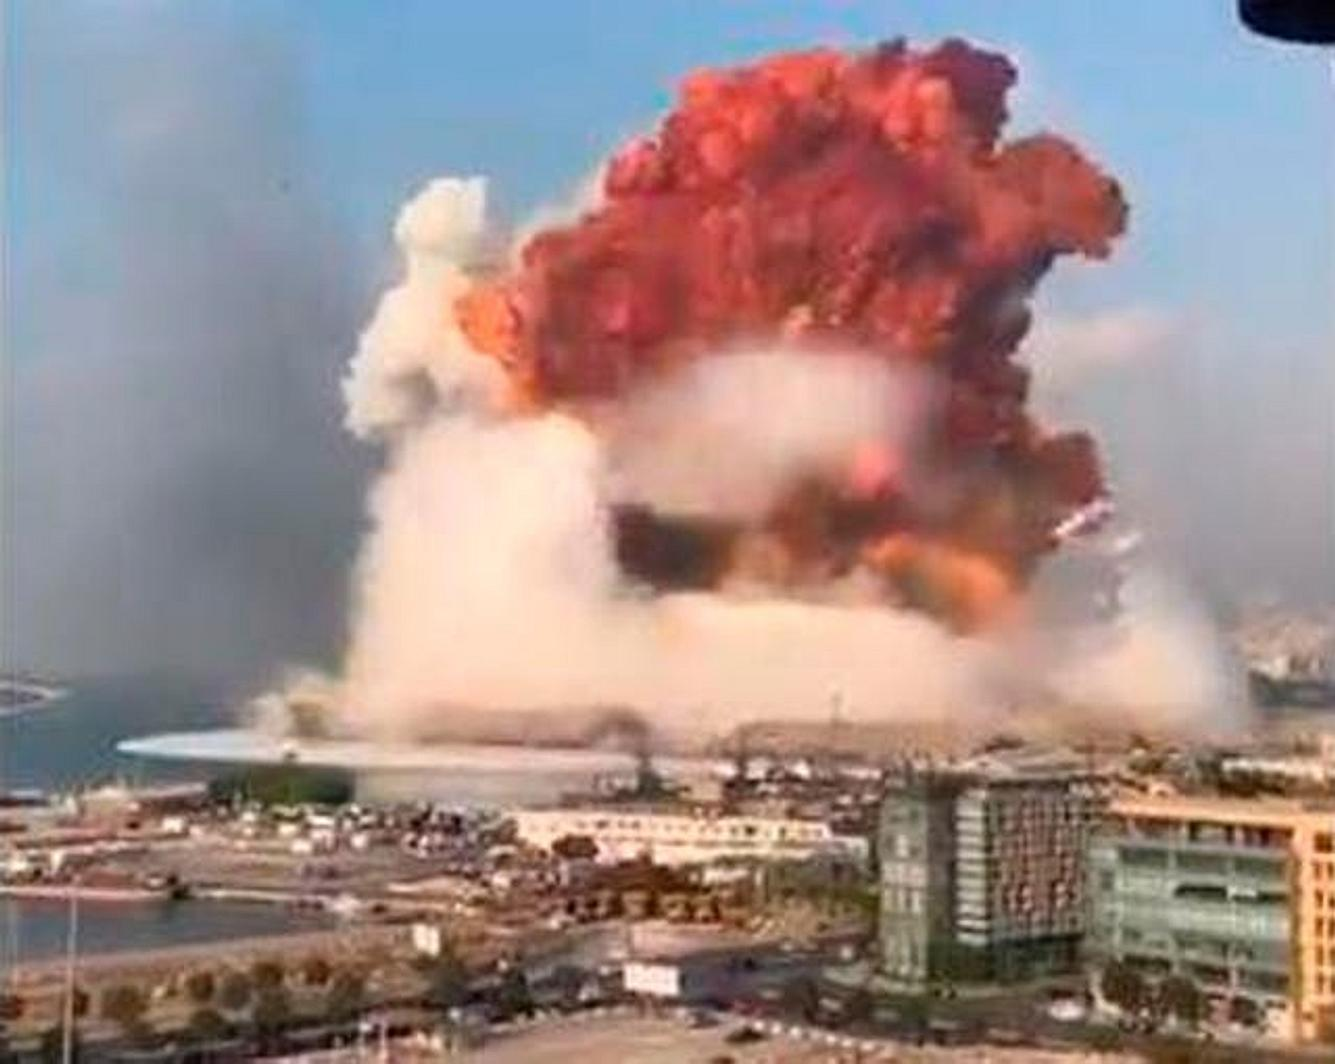 Eine massive Explosion erschüttert Beirut